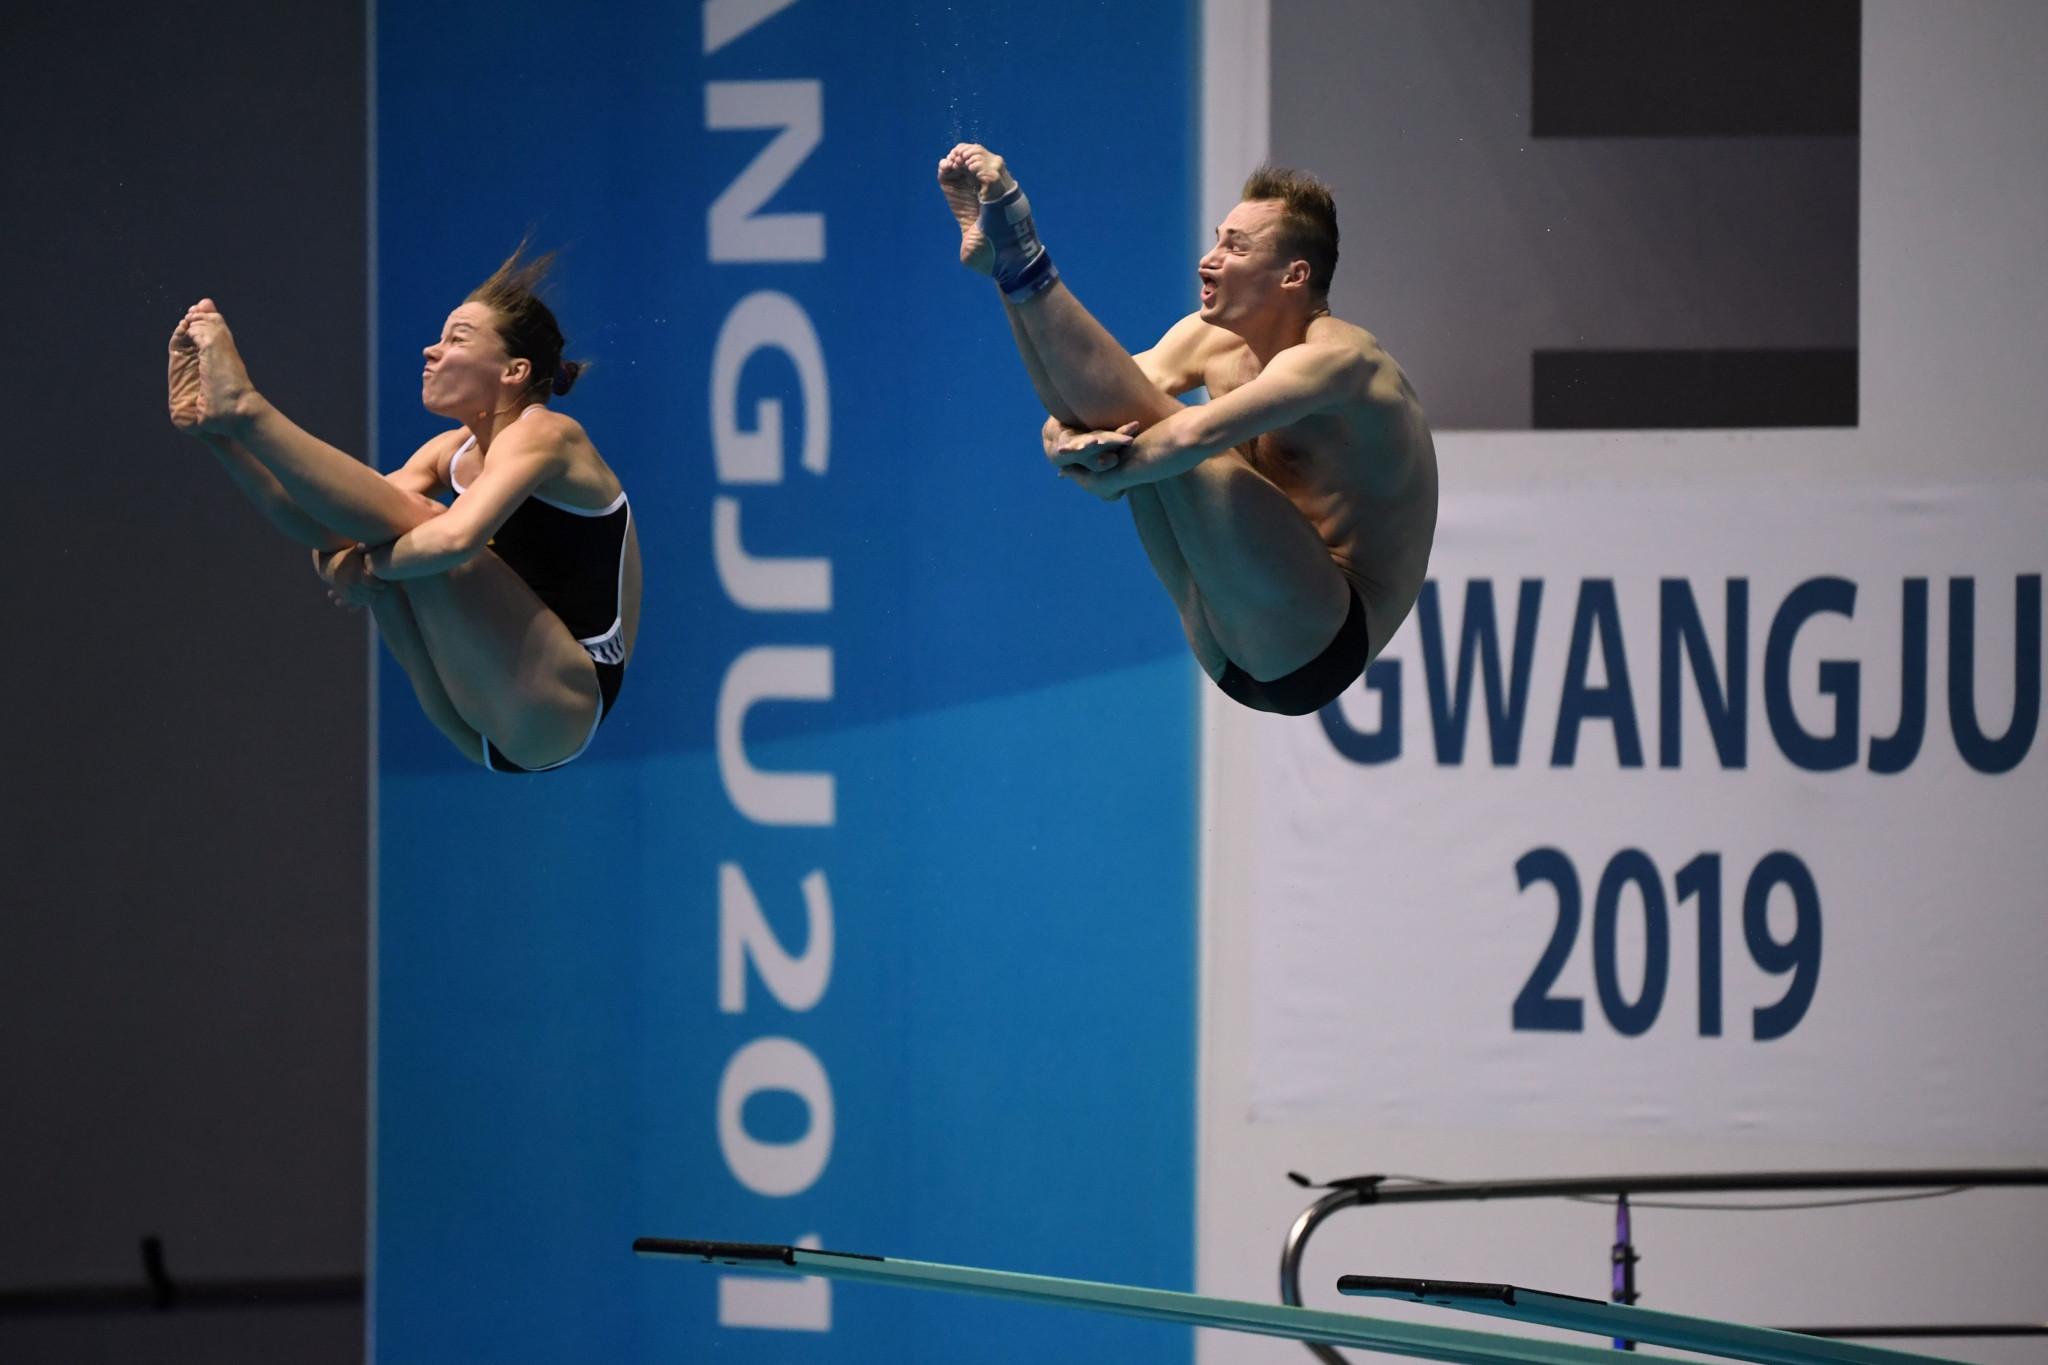 Viktoriya Kesar and Stanislav Oliferchyk of Ukraine won gold in the mixed 3m synchro final ©Getty Images